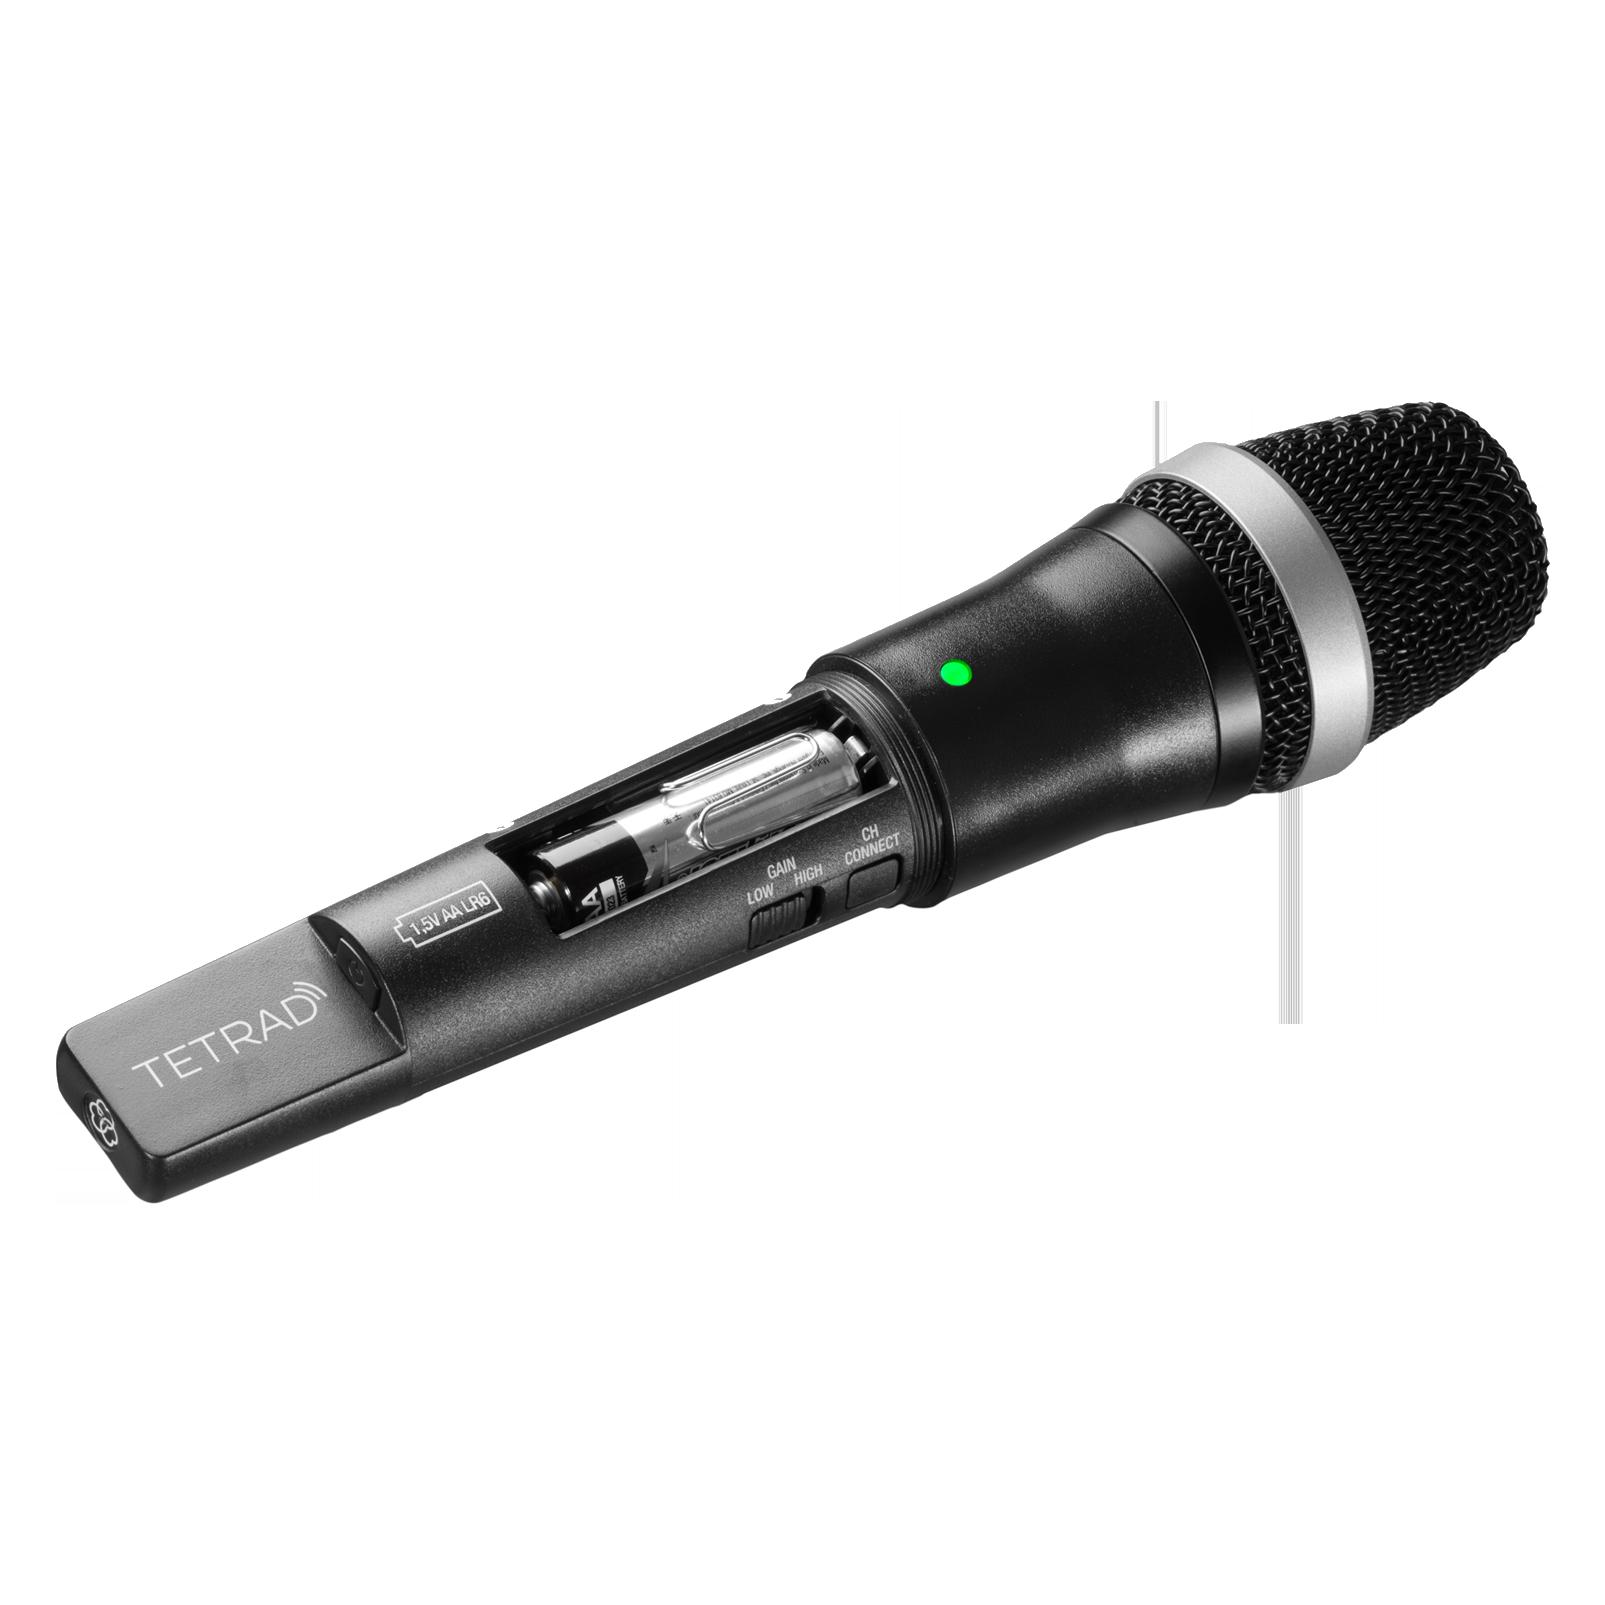 DHTTETRAD D5 (NON-EU) - Black - Professional digital handheld transmitter - Detailshot 1